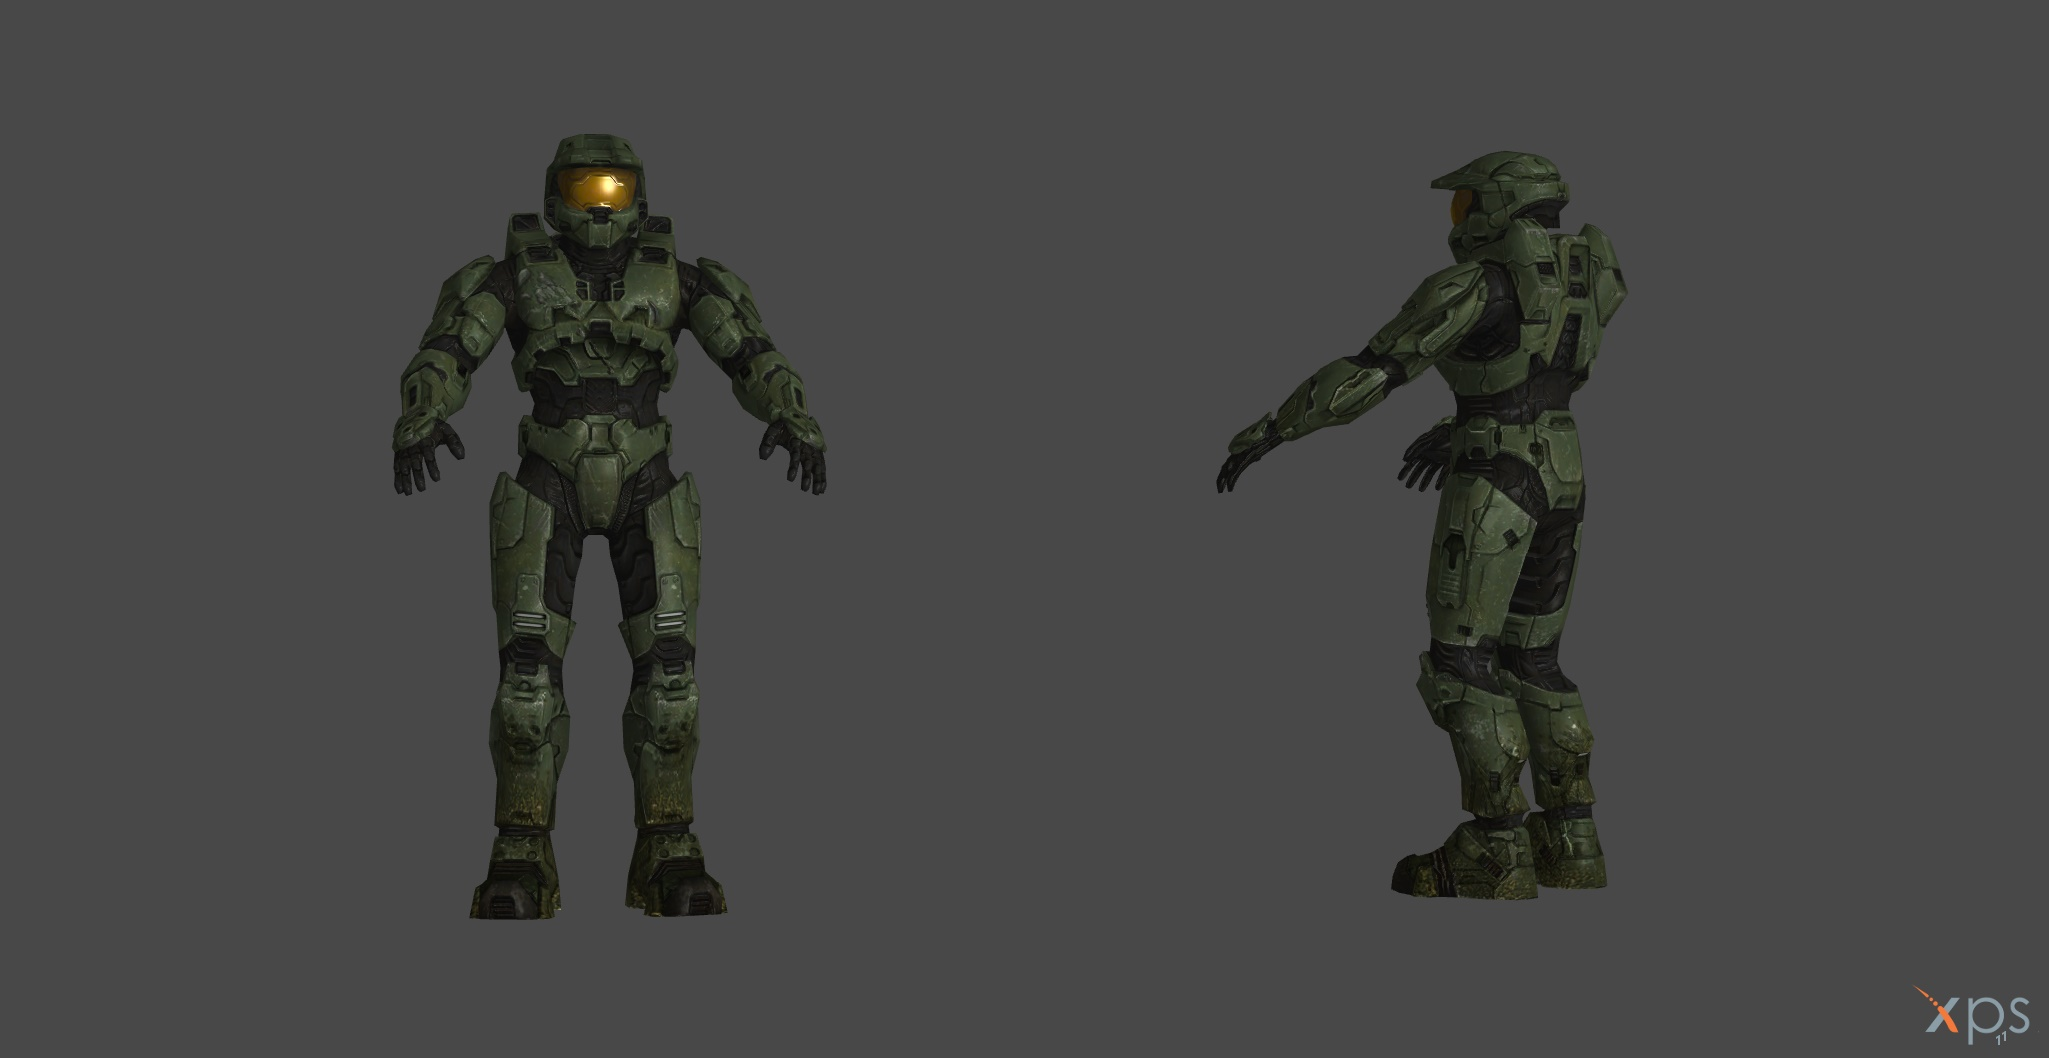 Halo 3 MasterChief XPS model by navie9888ch on DeviantArt